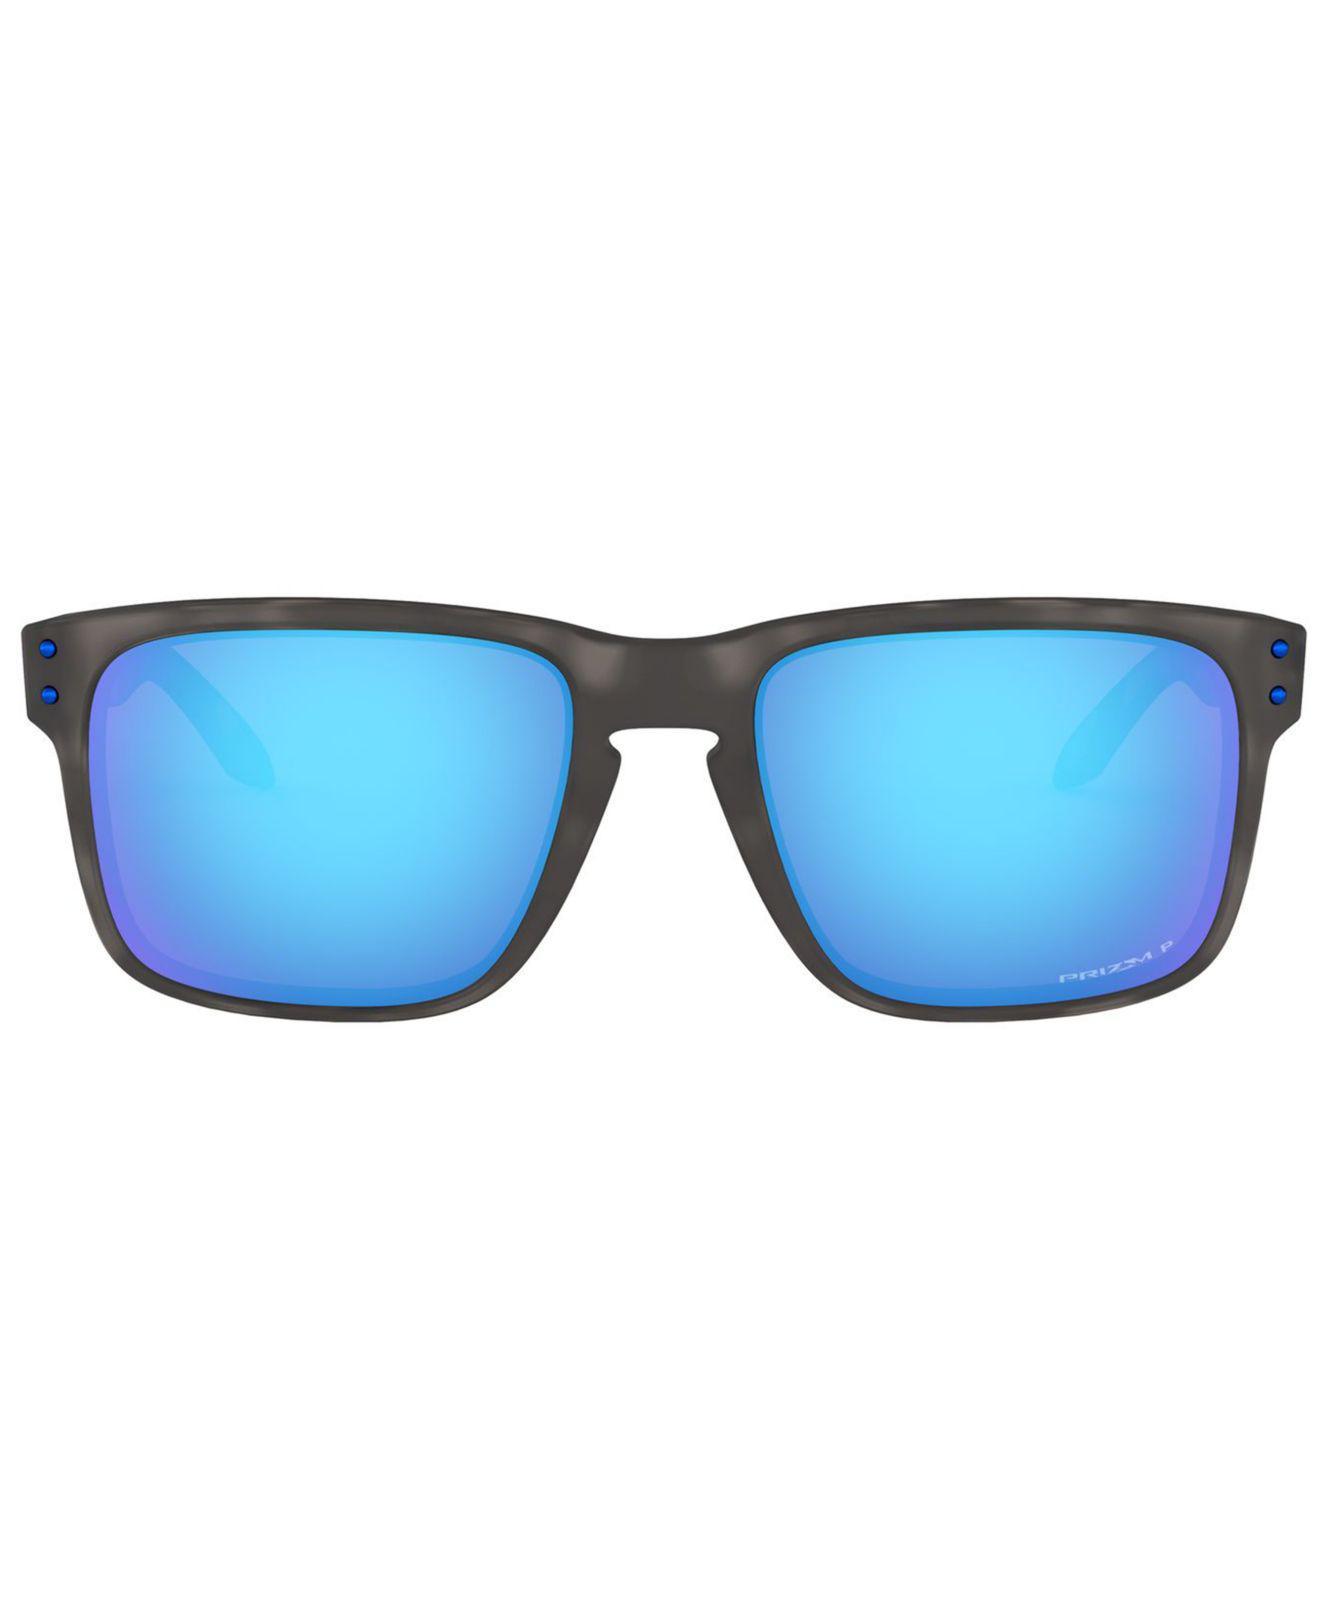 67bb662bed1 Lyst - Oakley Polarized Sunglasses